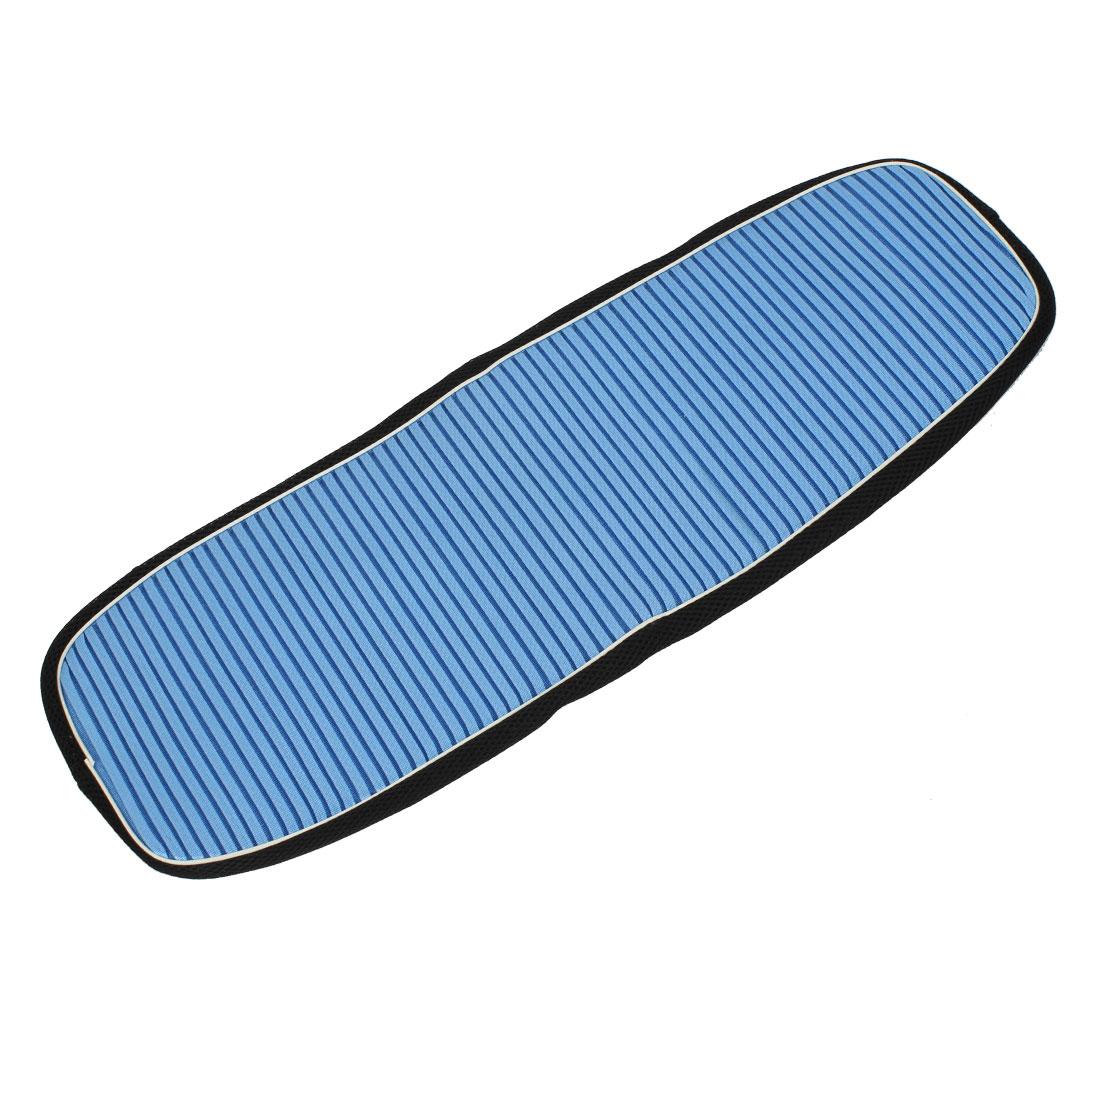 Blue Mesh Motorcycle Seat Cover Breathable Elastic Adiabatic Saddle Pad